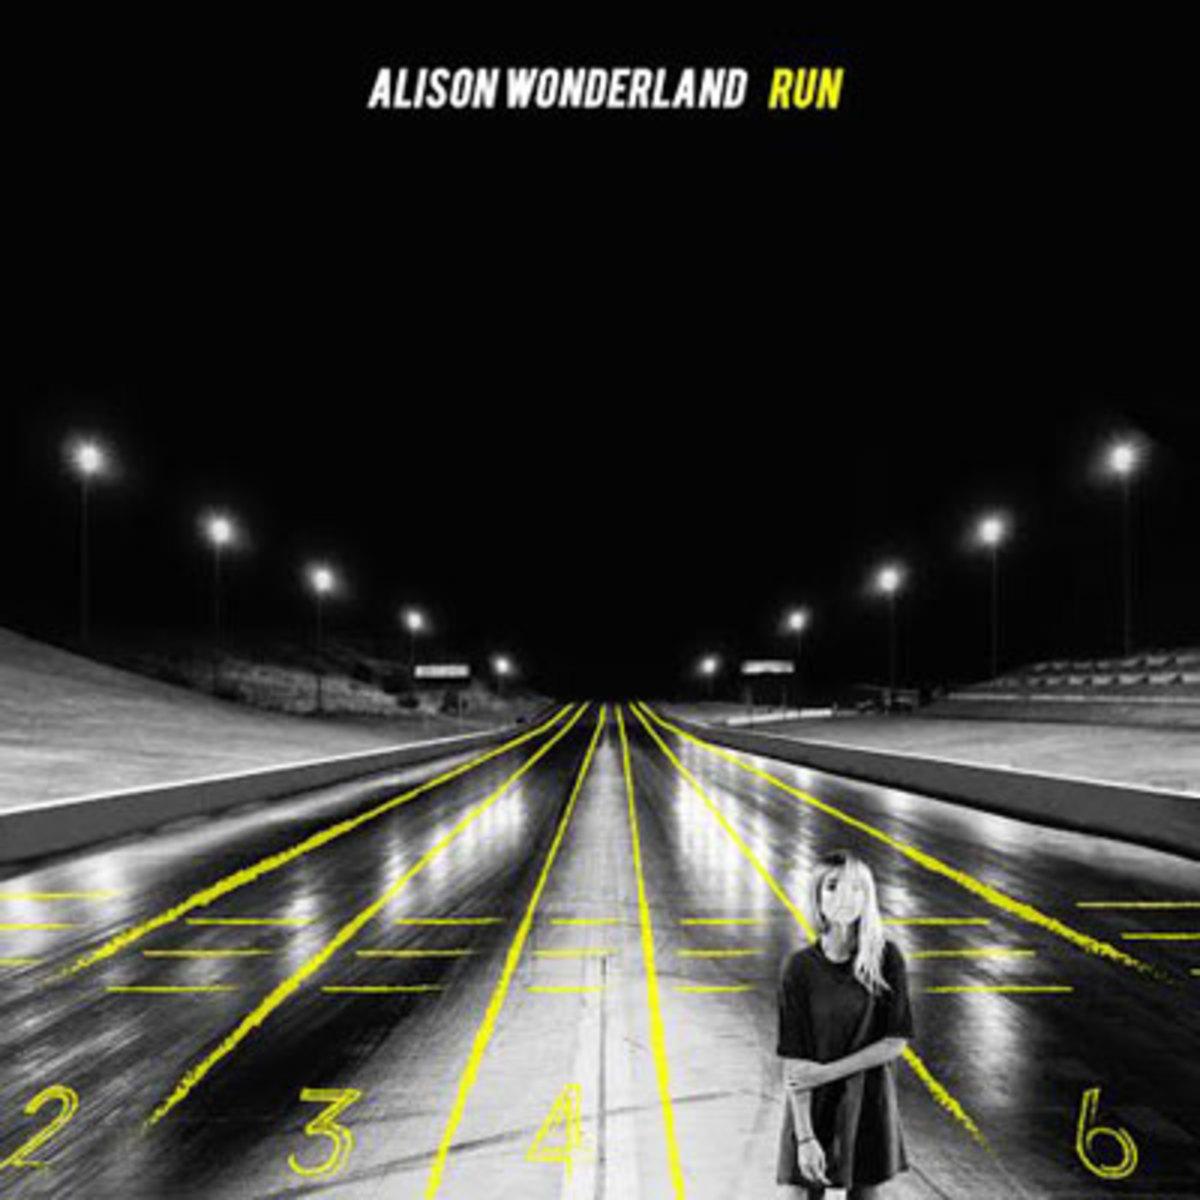 alisonwonderland-run.jpg